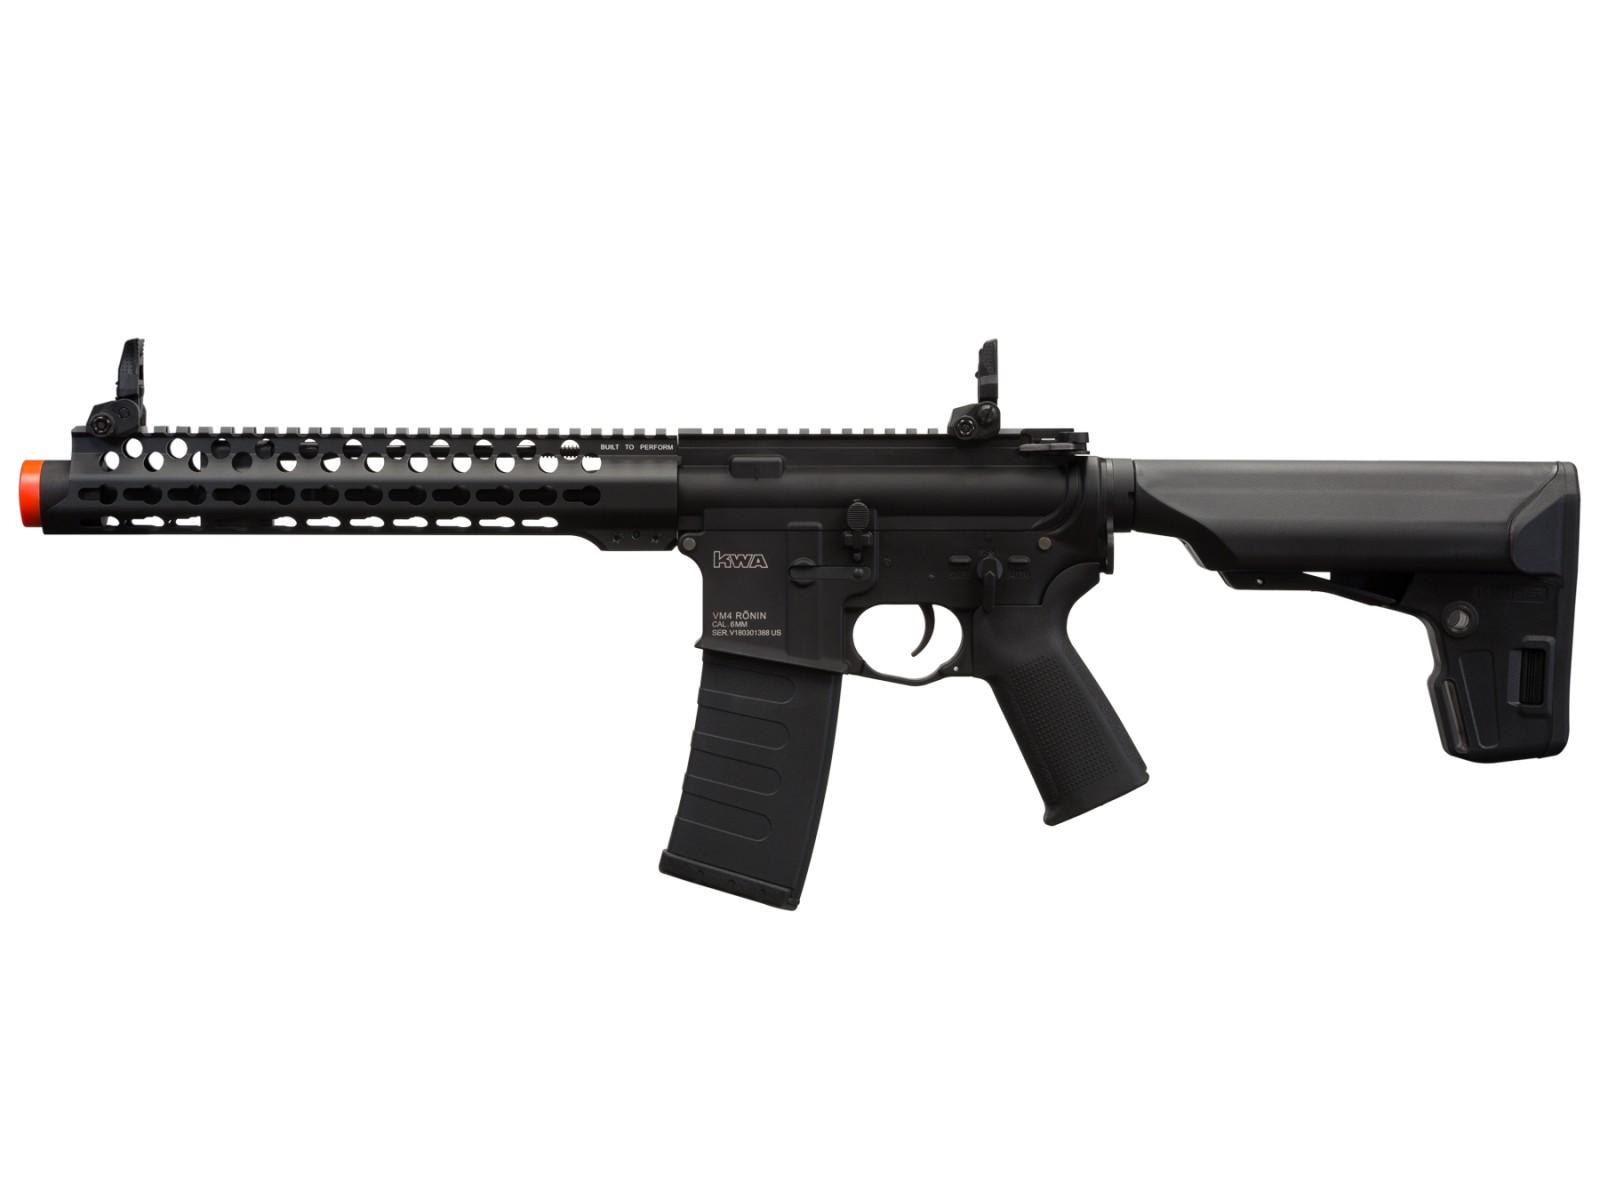 KWA VM4 Ronin 10 SBR AEG 2.5 Airsoft Rifle 6mm